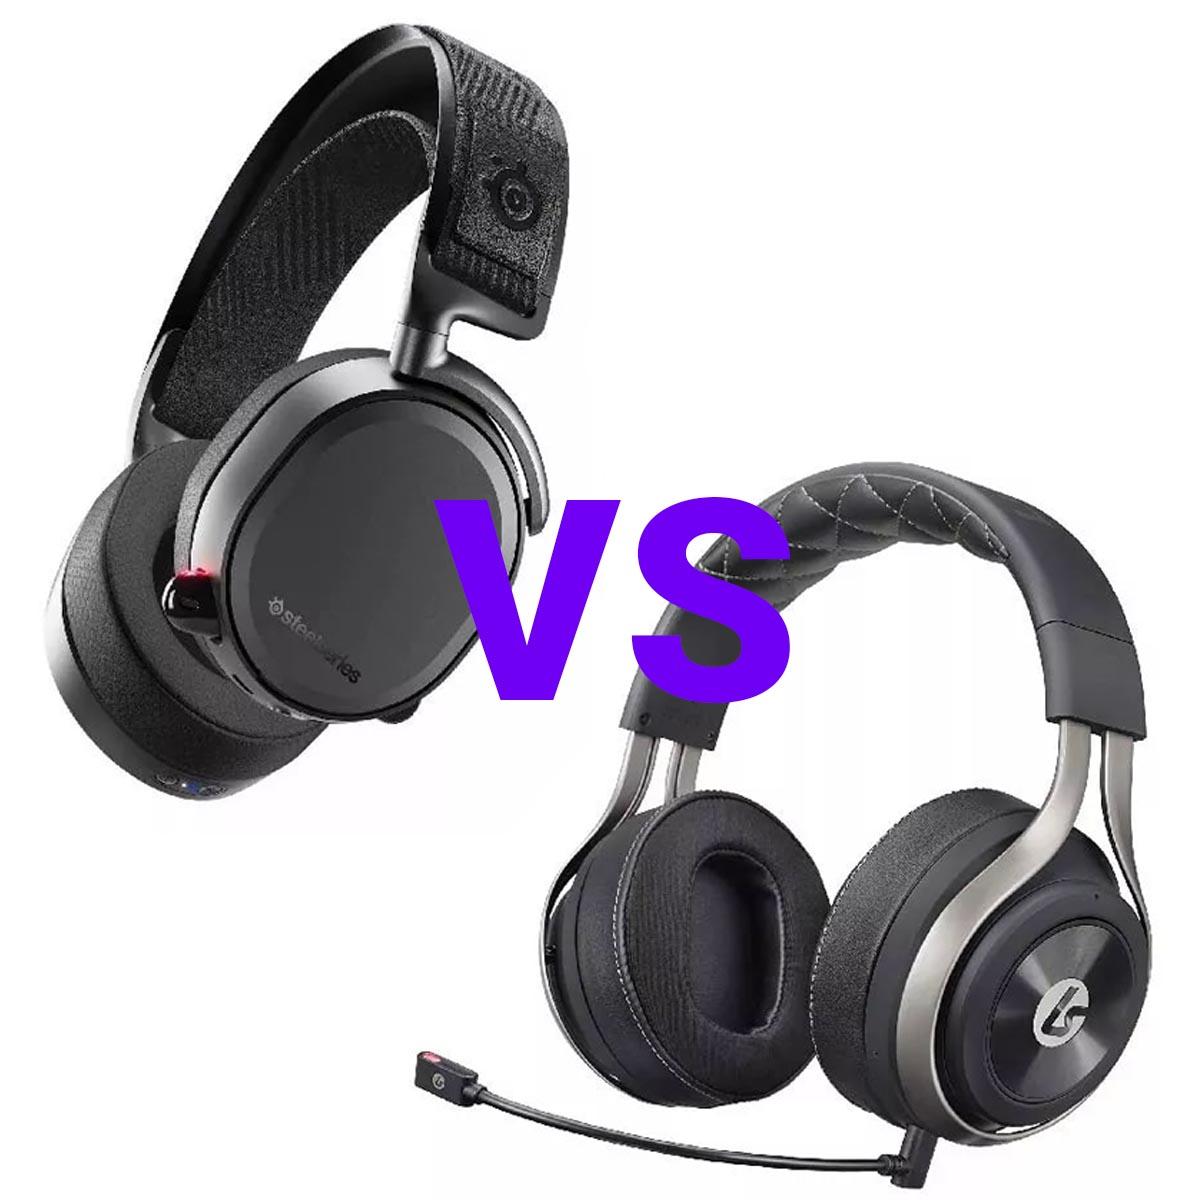 SteelSeries Arctis Pro Wireless против LucidSound LS50X сравнение игровых гарнитур